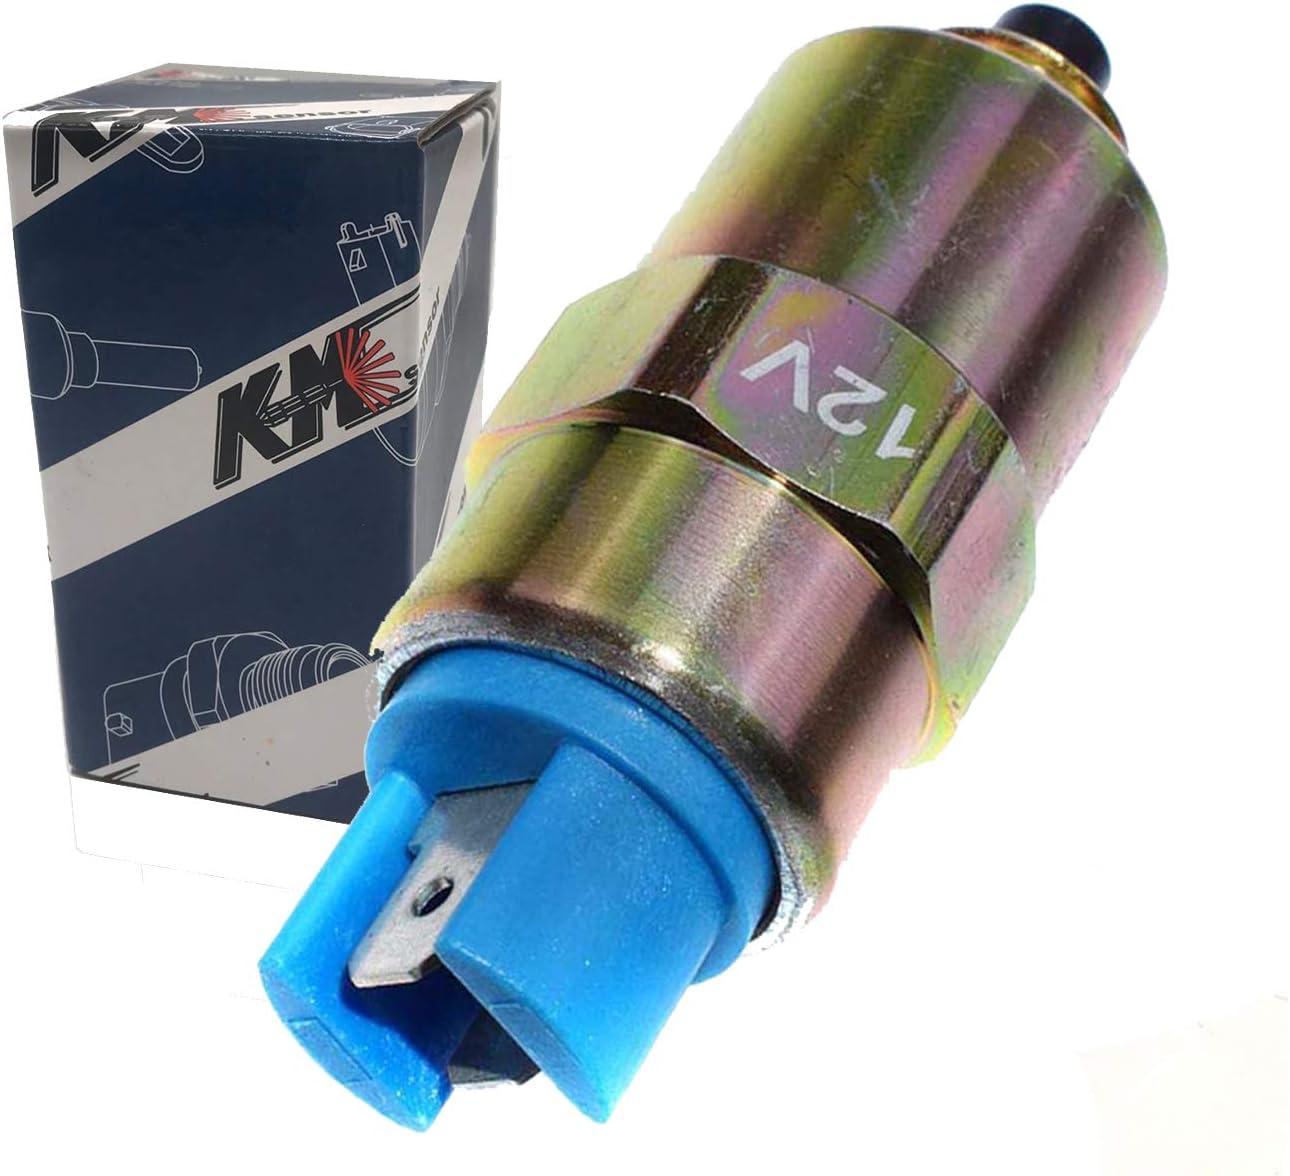 kmdiesel 7167-620D 12V Shut off Solenoid For Perkins 1000 Series Engine 1000 DPA DPS CAV LUCAS 7185-900T 7167-620C 28730179 tractor